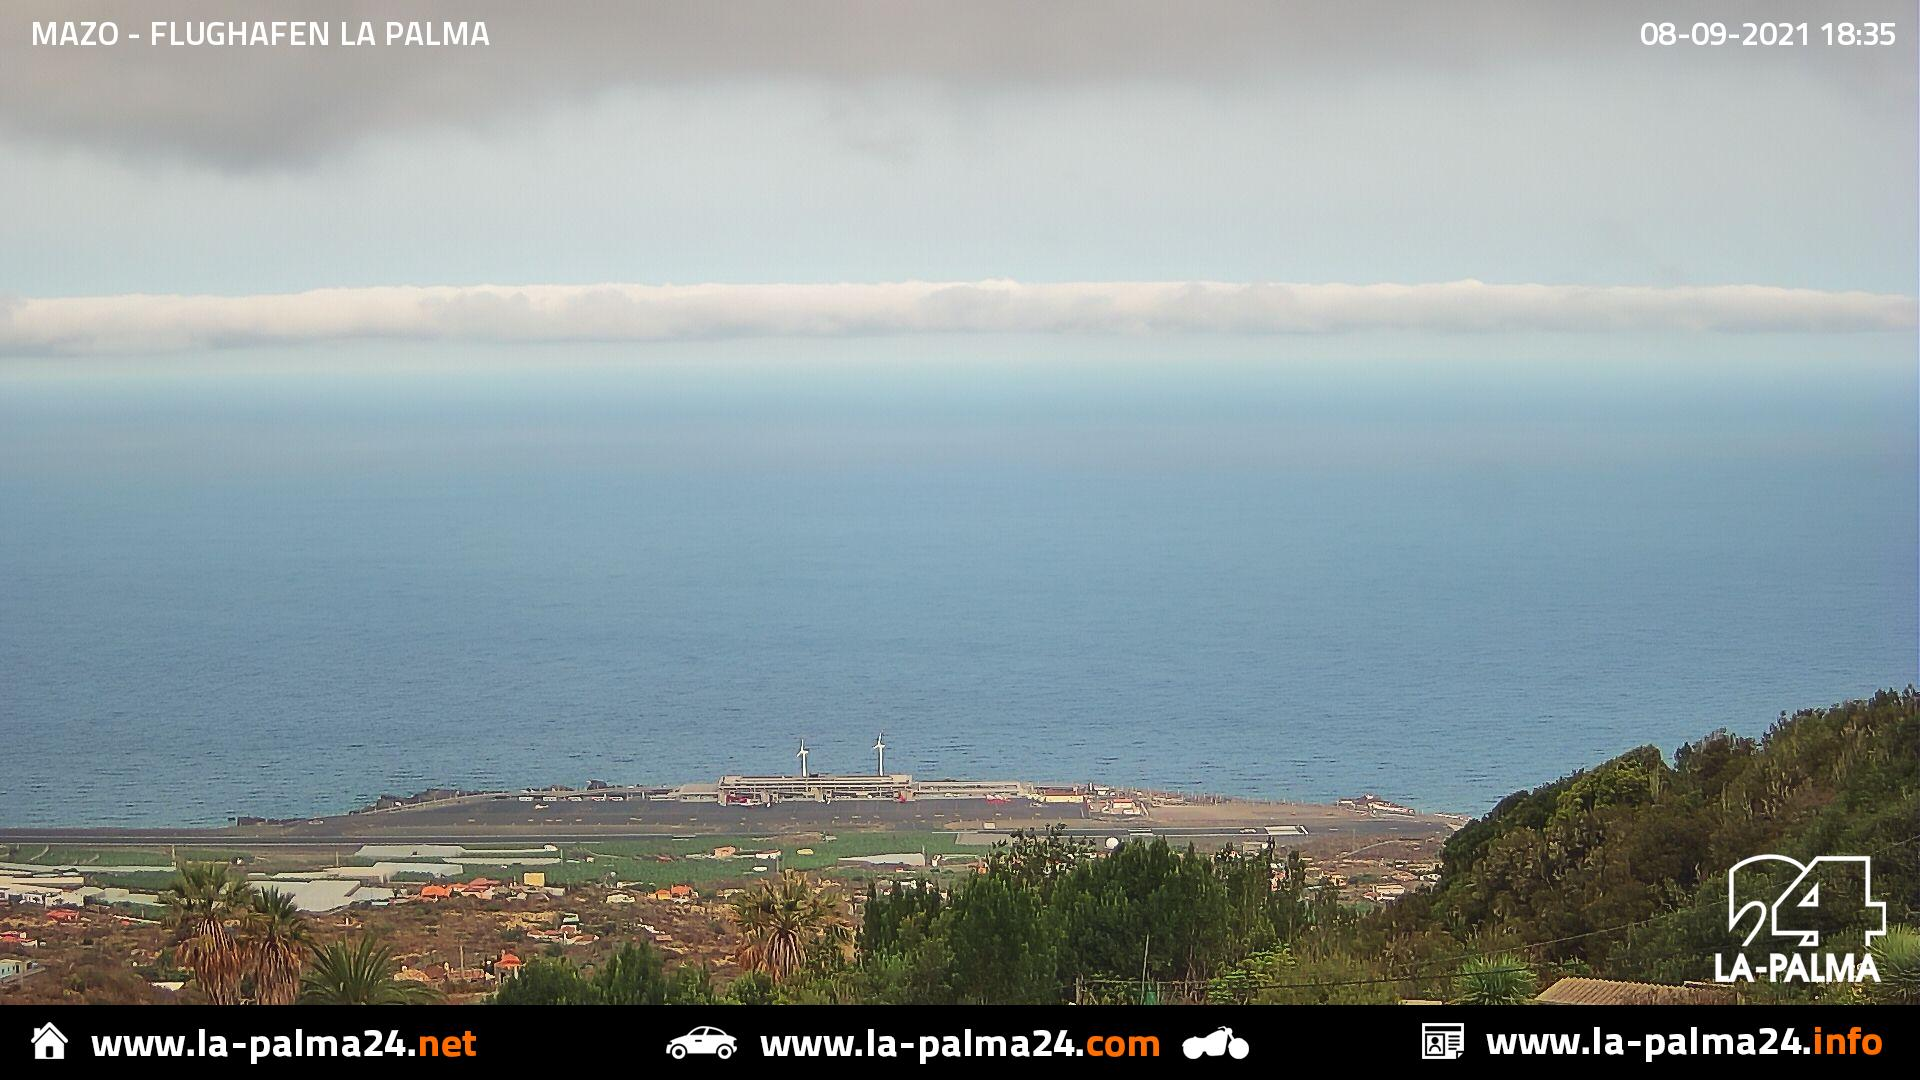 Mazo - Flughafen La Palma